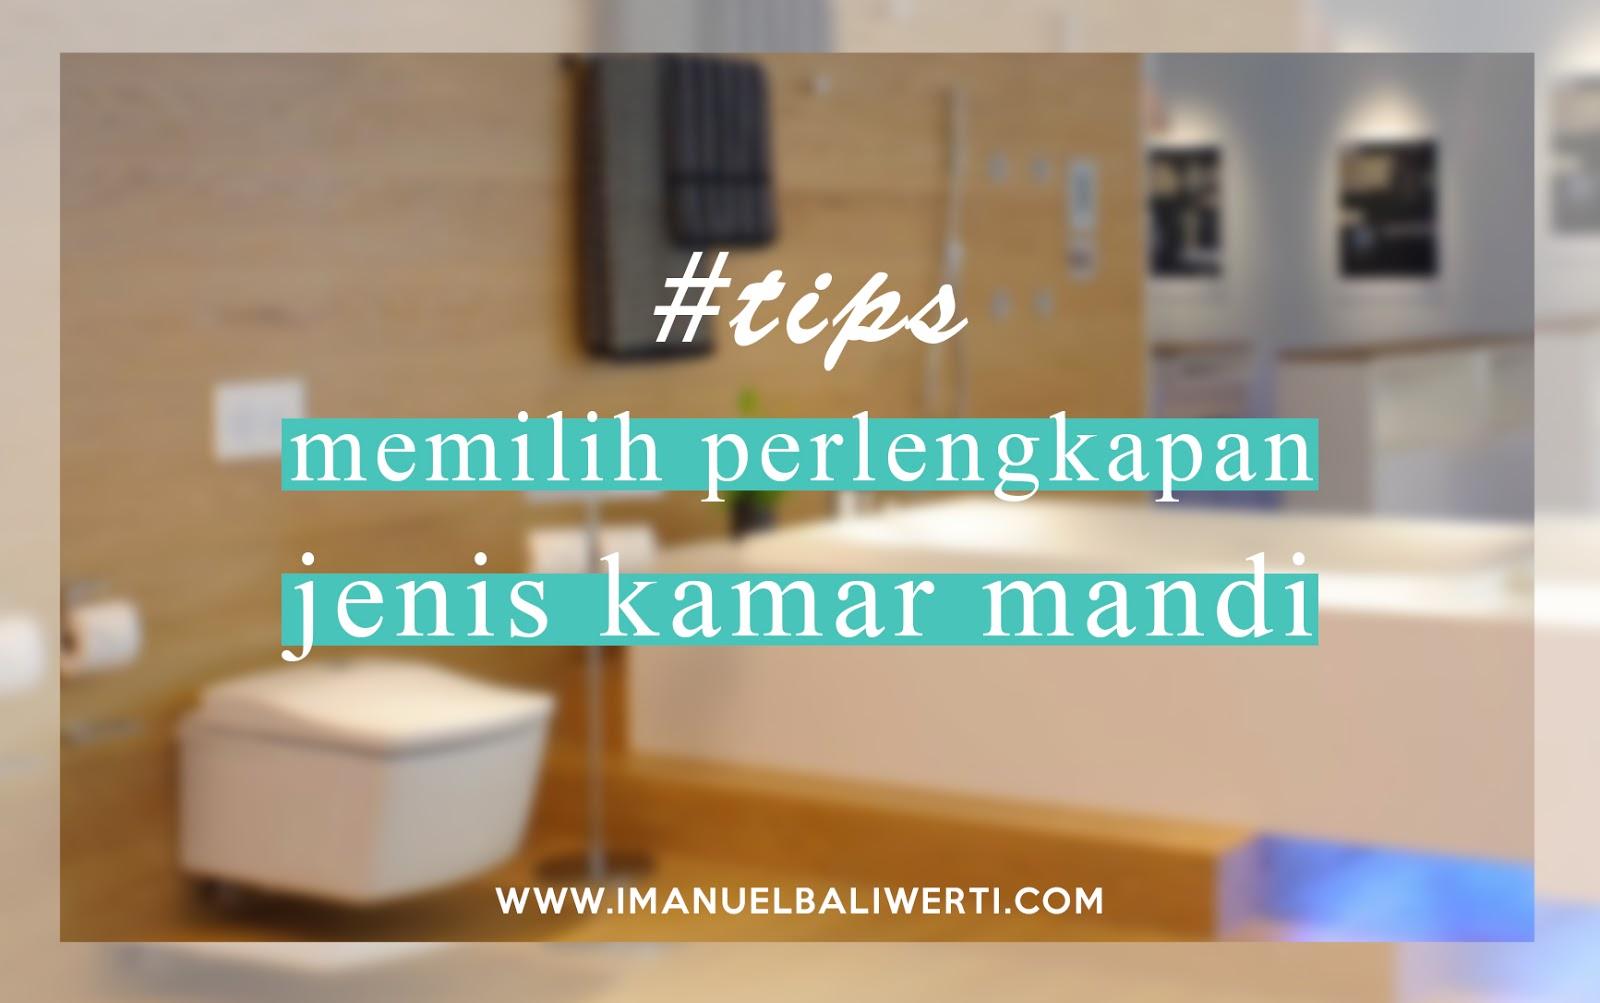 Tips Memilih Perlengkapan Sesuai Jenis Kamar Mandi Imanuel